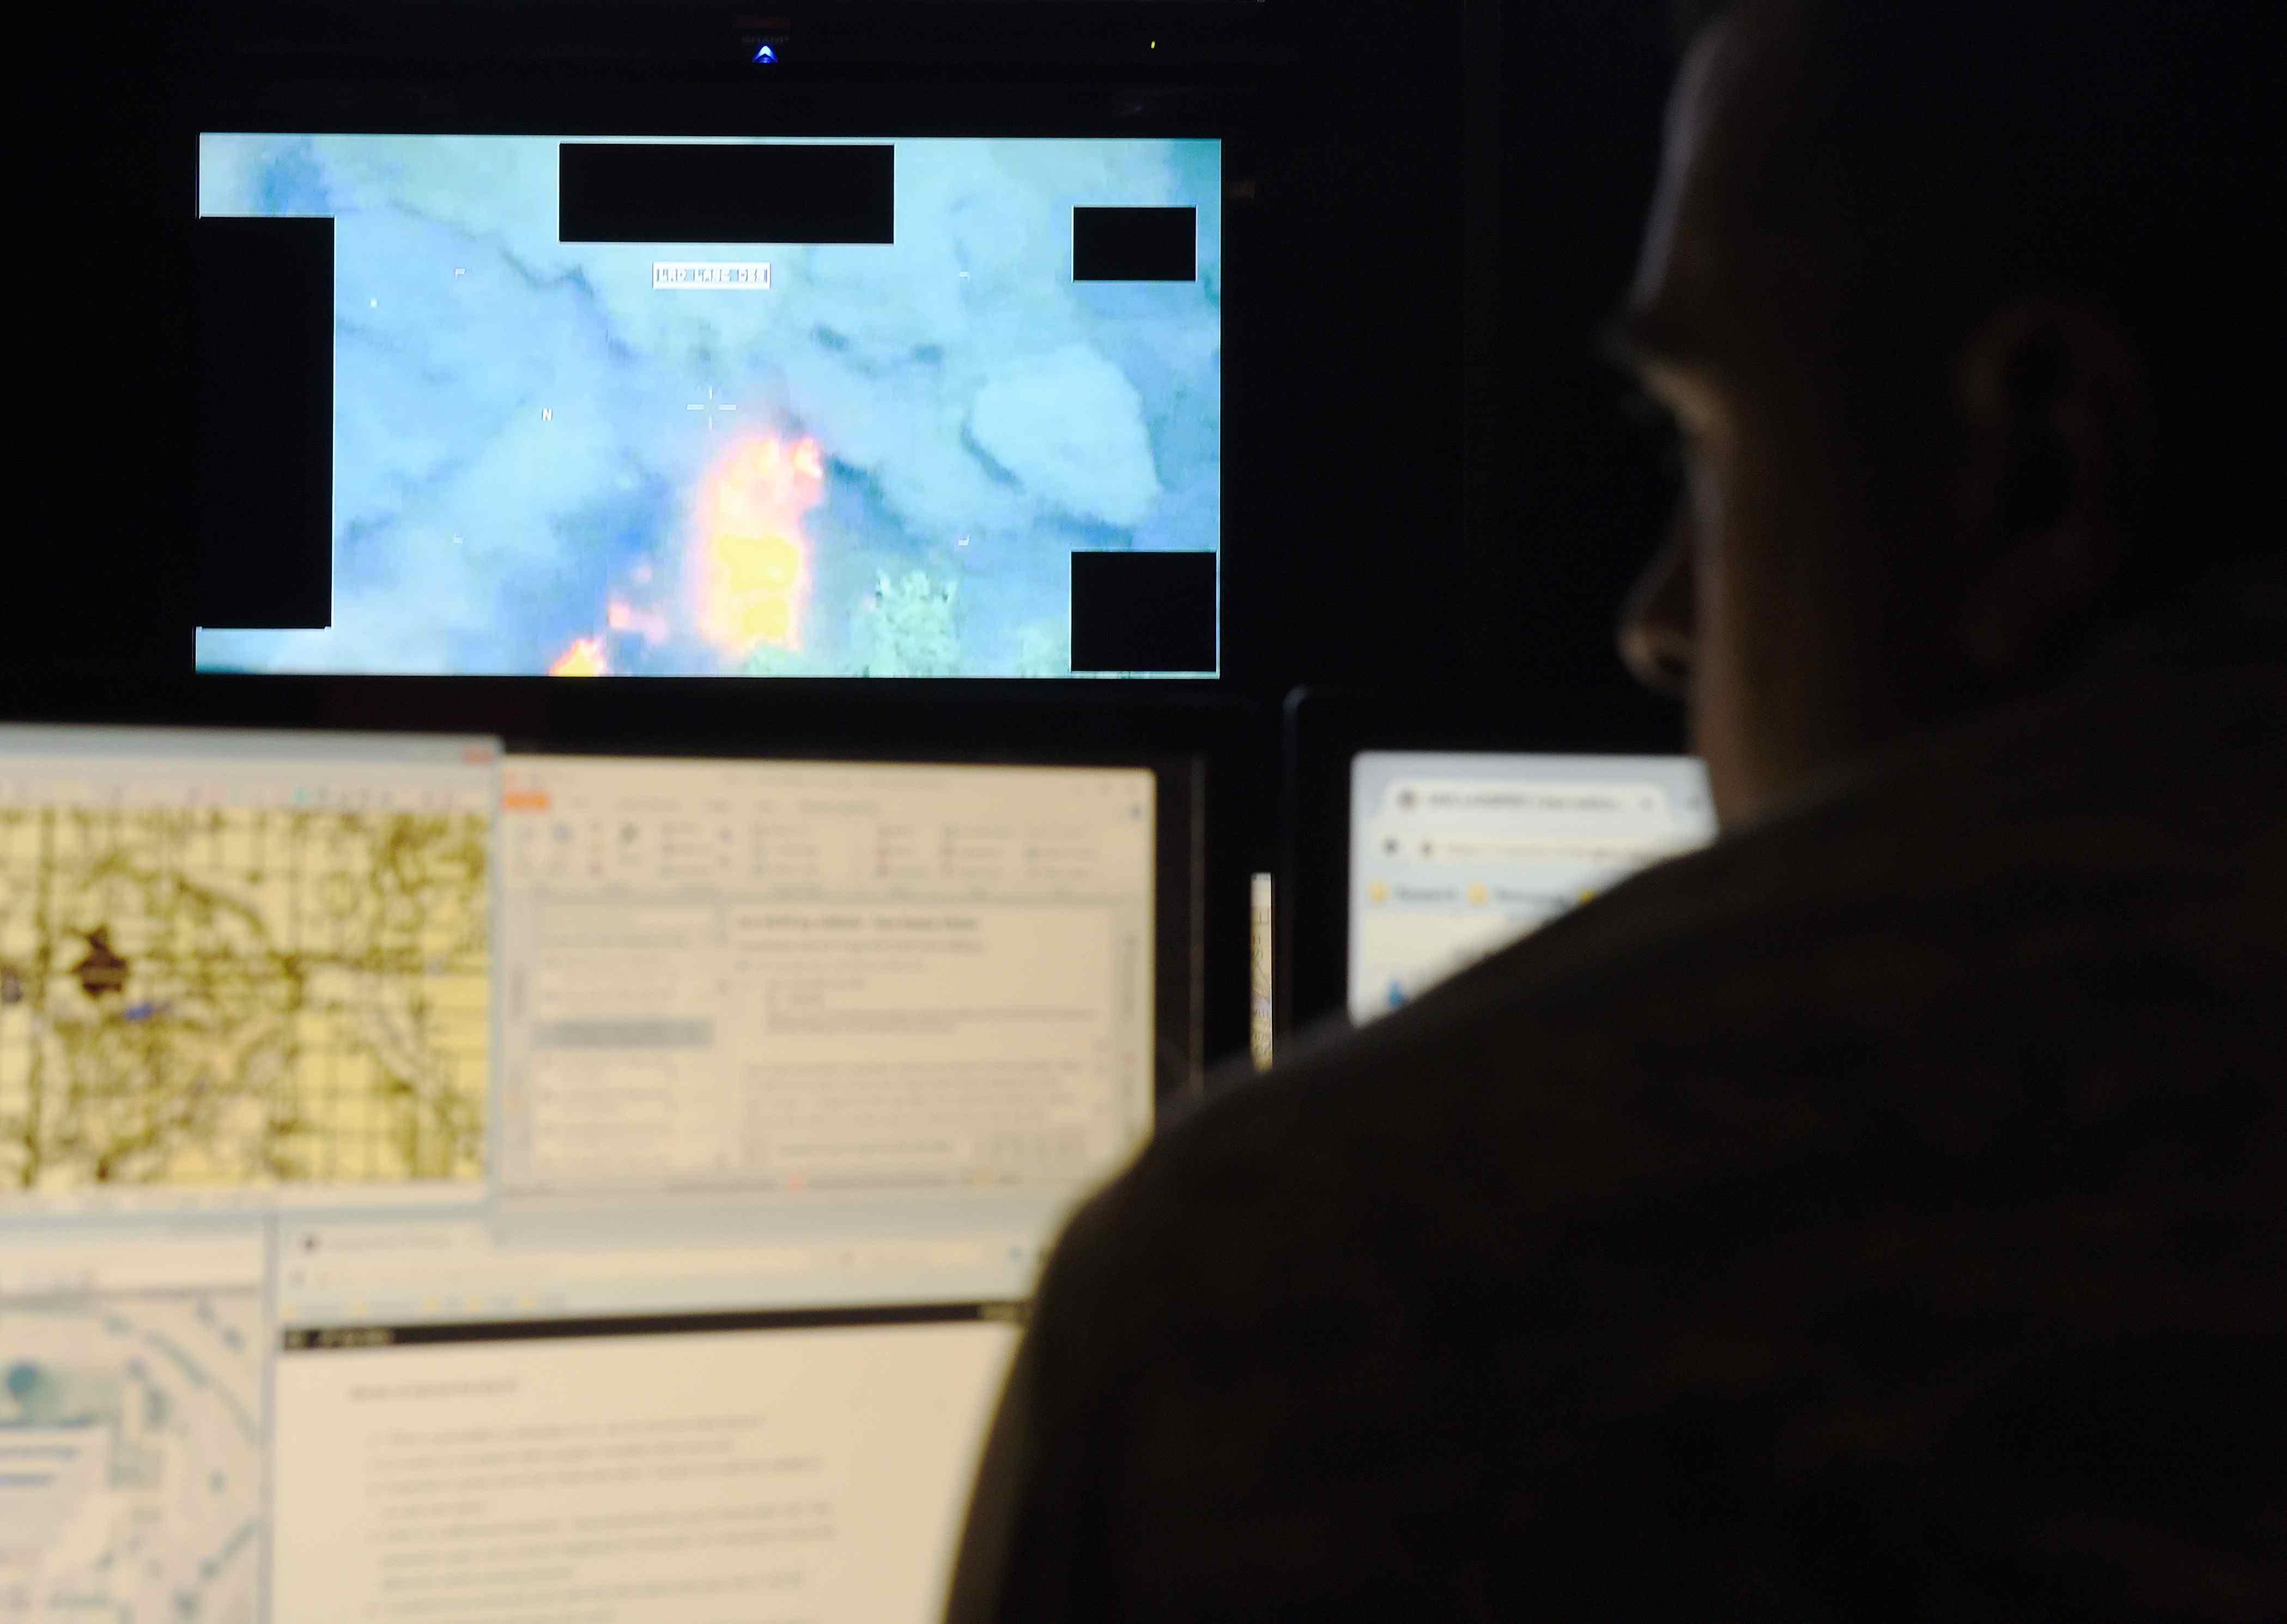 hurlburt field, isr, drones, 11th intelligence squadron